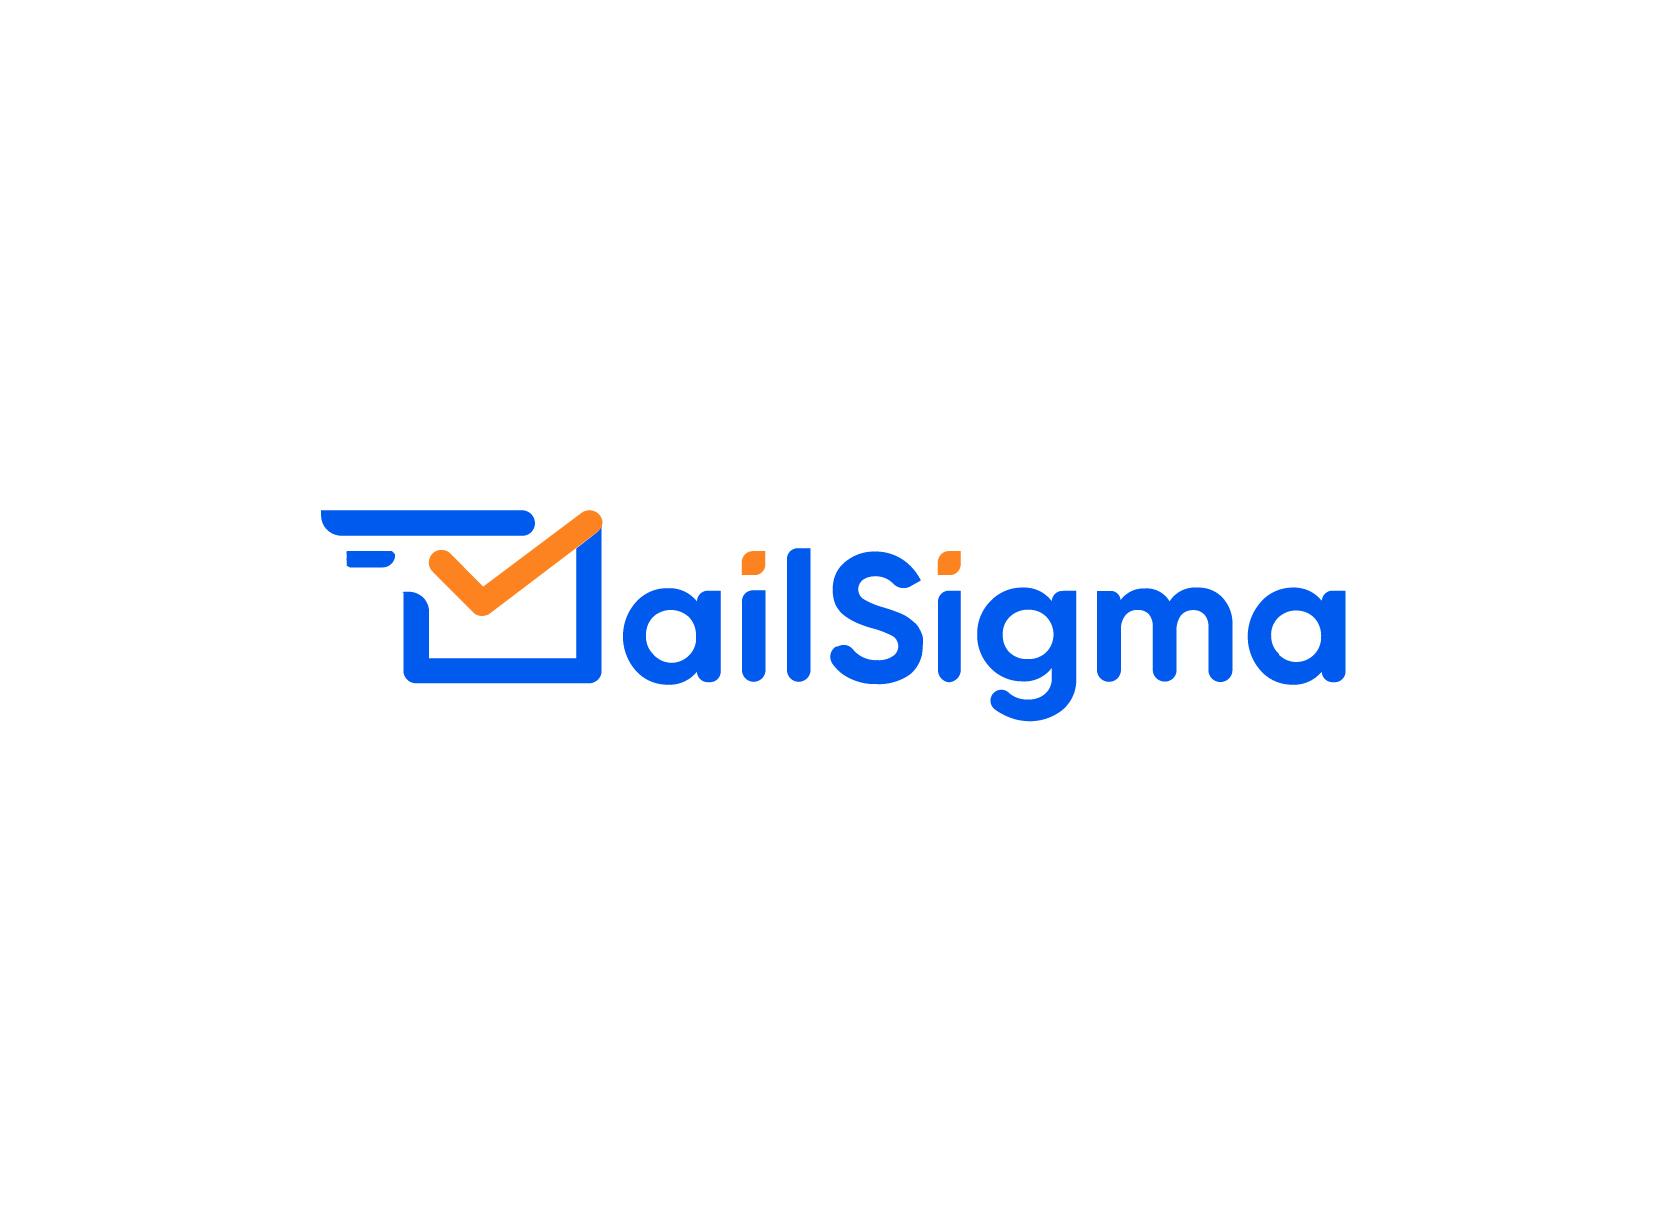 logo design services Mailsigma